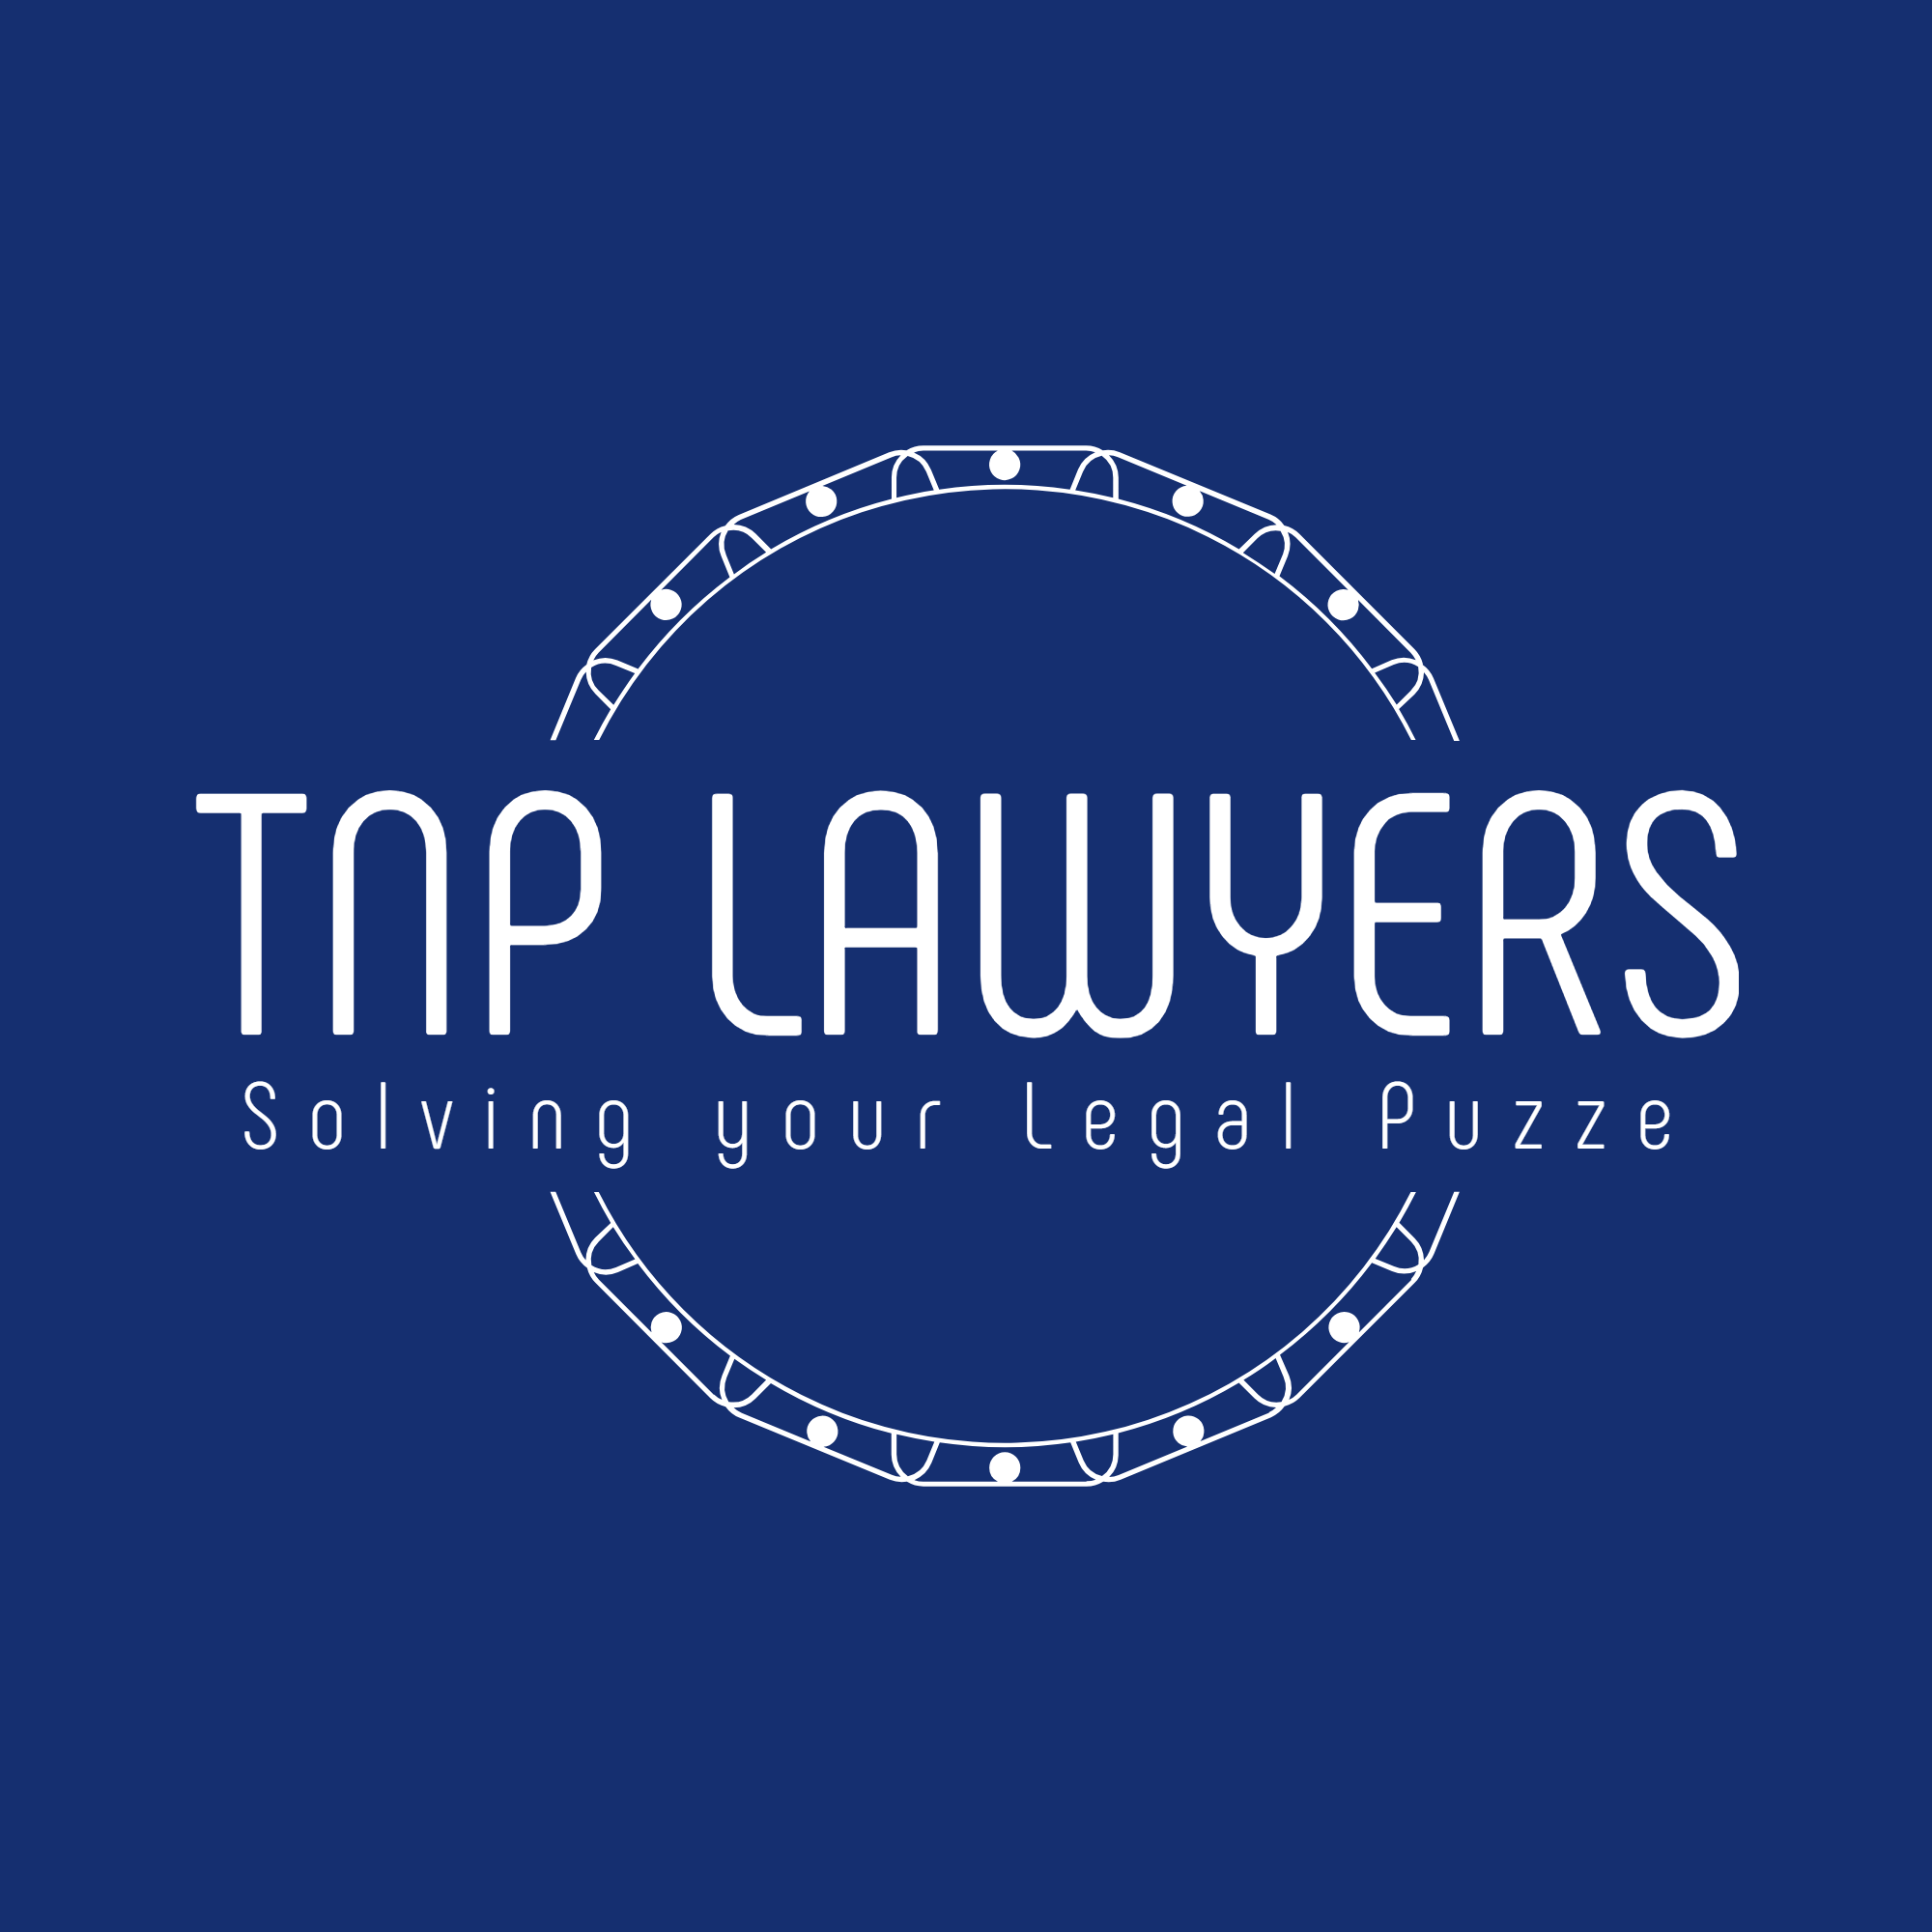 TNP LAWYERS